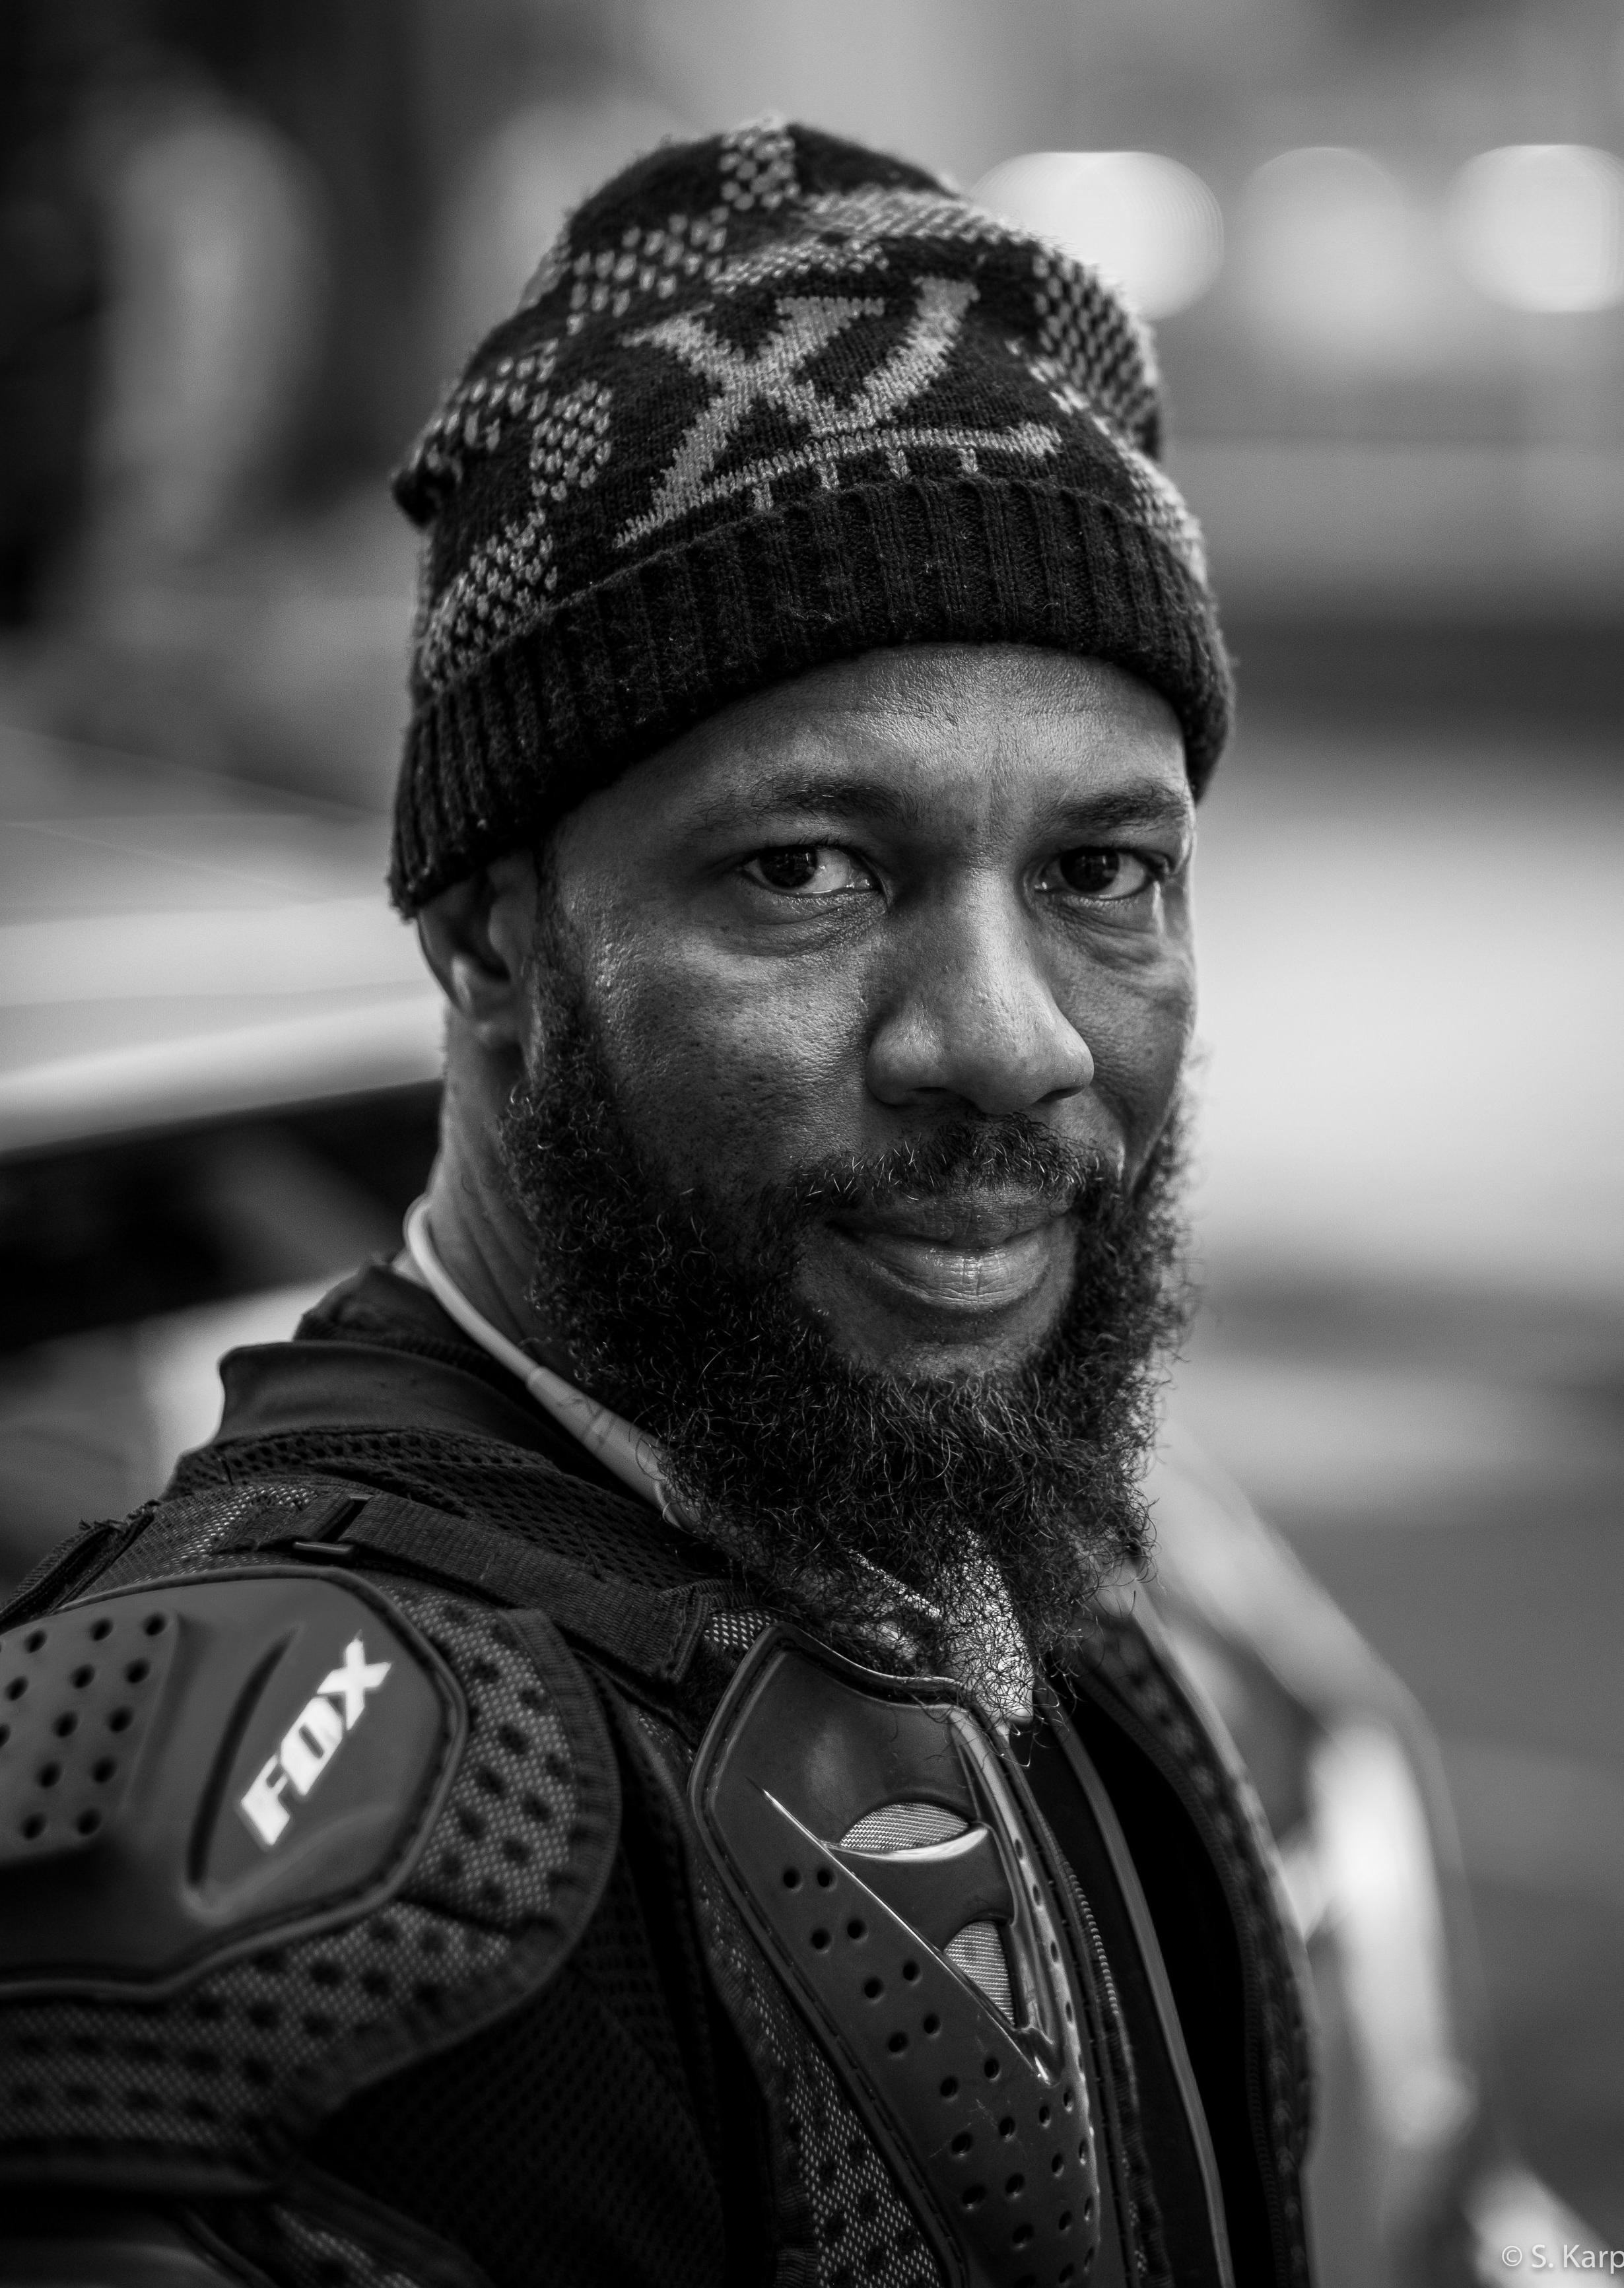 Motorcyclist ©2019 Karp